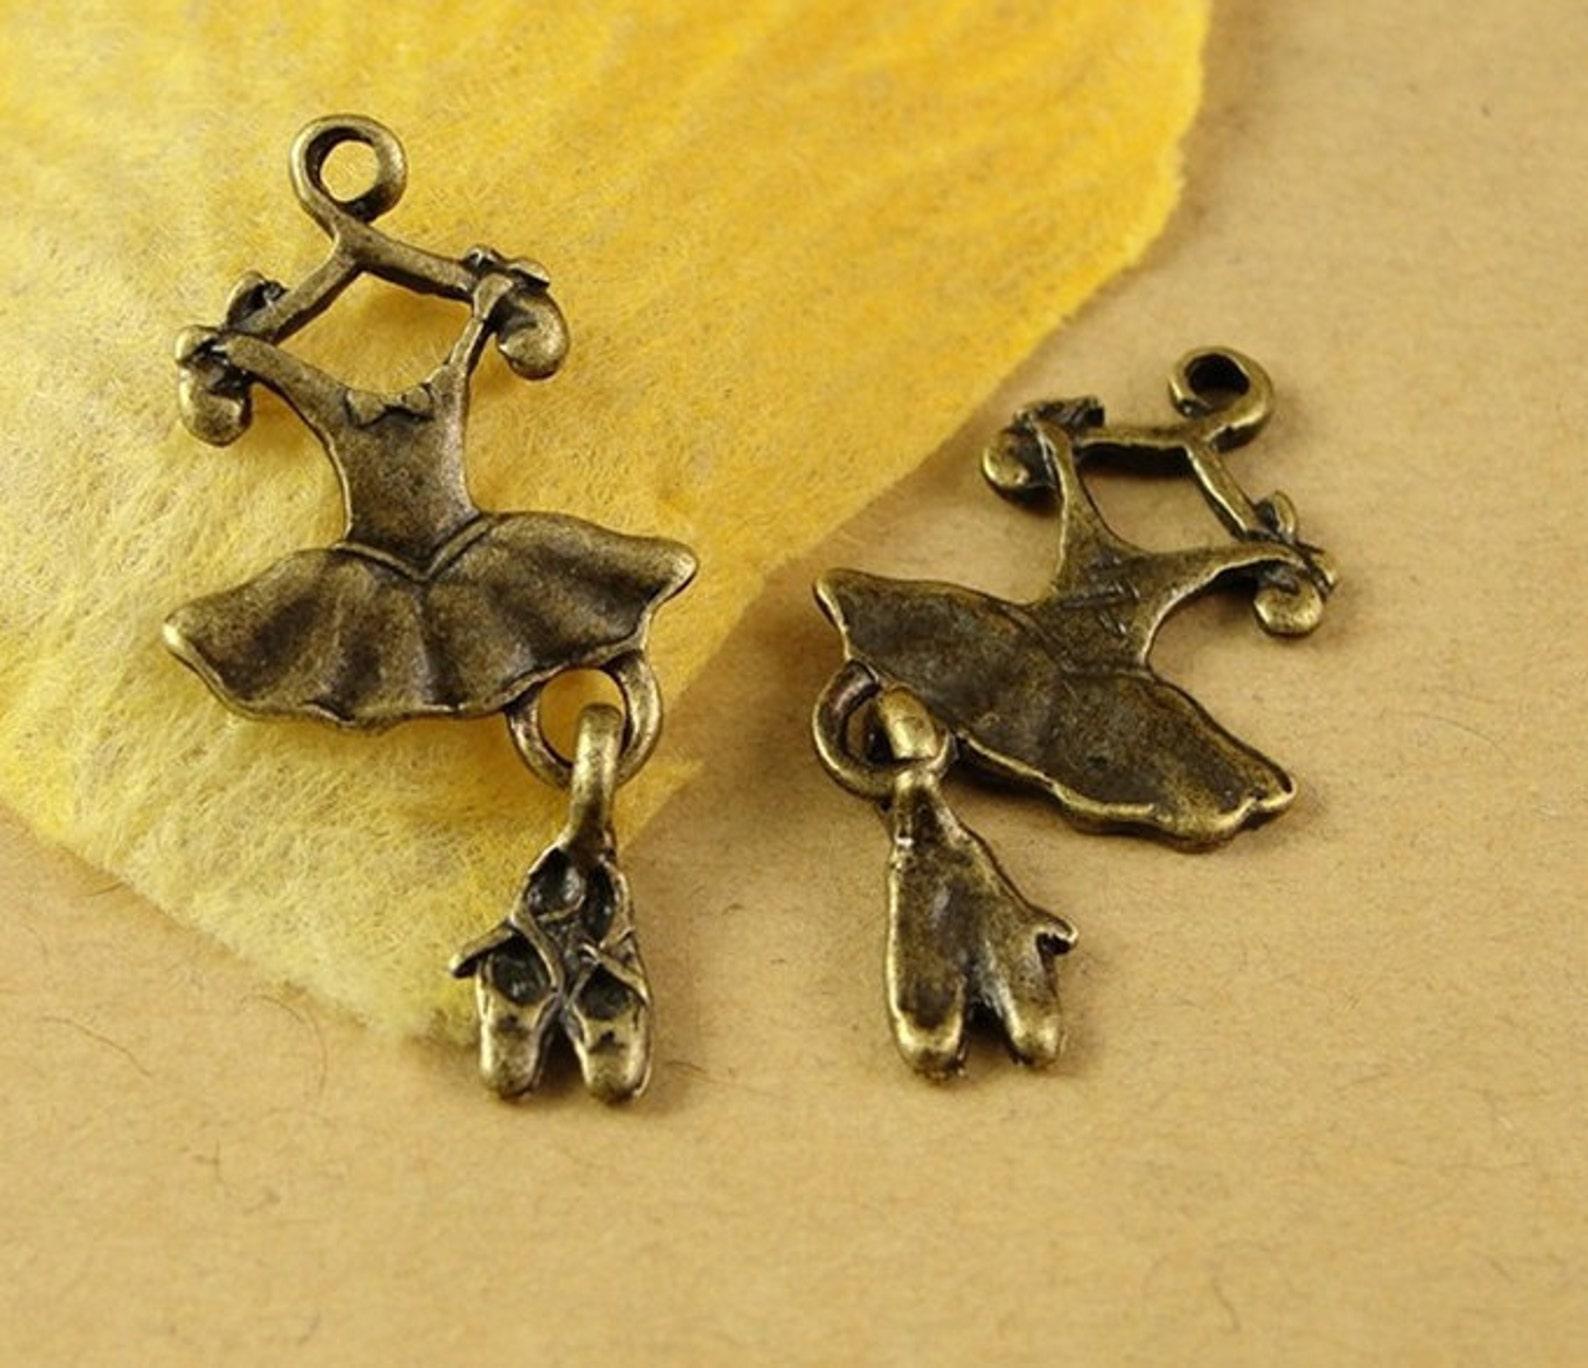 bulk lot 50pcs of 26x13mm dress and ballet shoes charm pendants connector wholesale charms antique bronze jewelry findings pa130